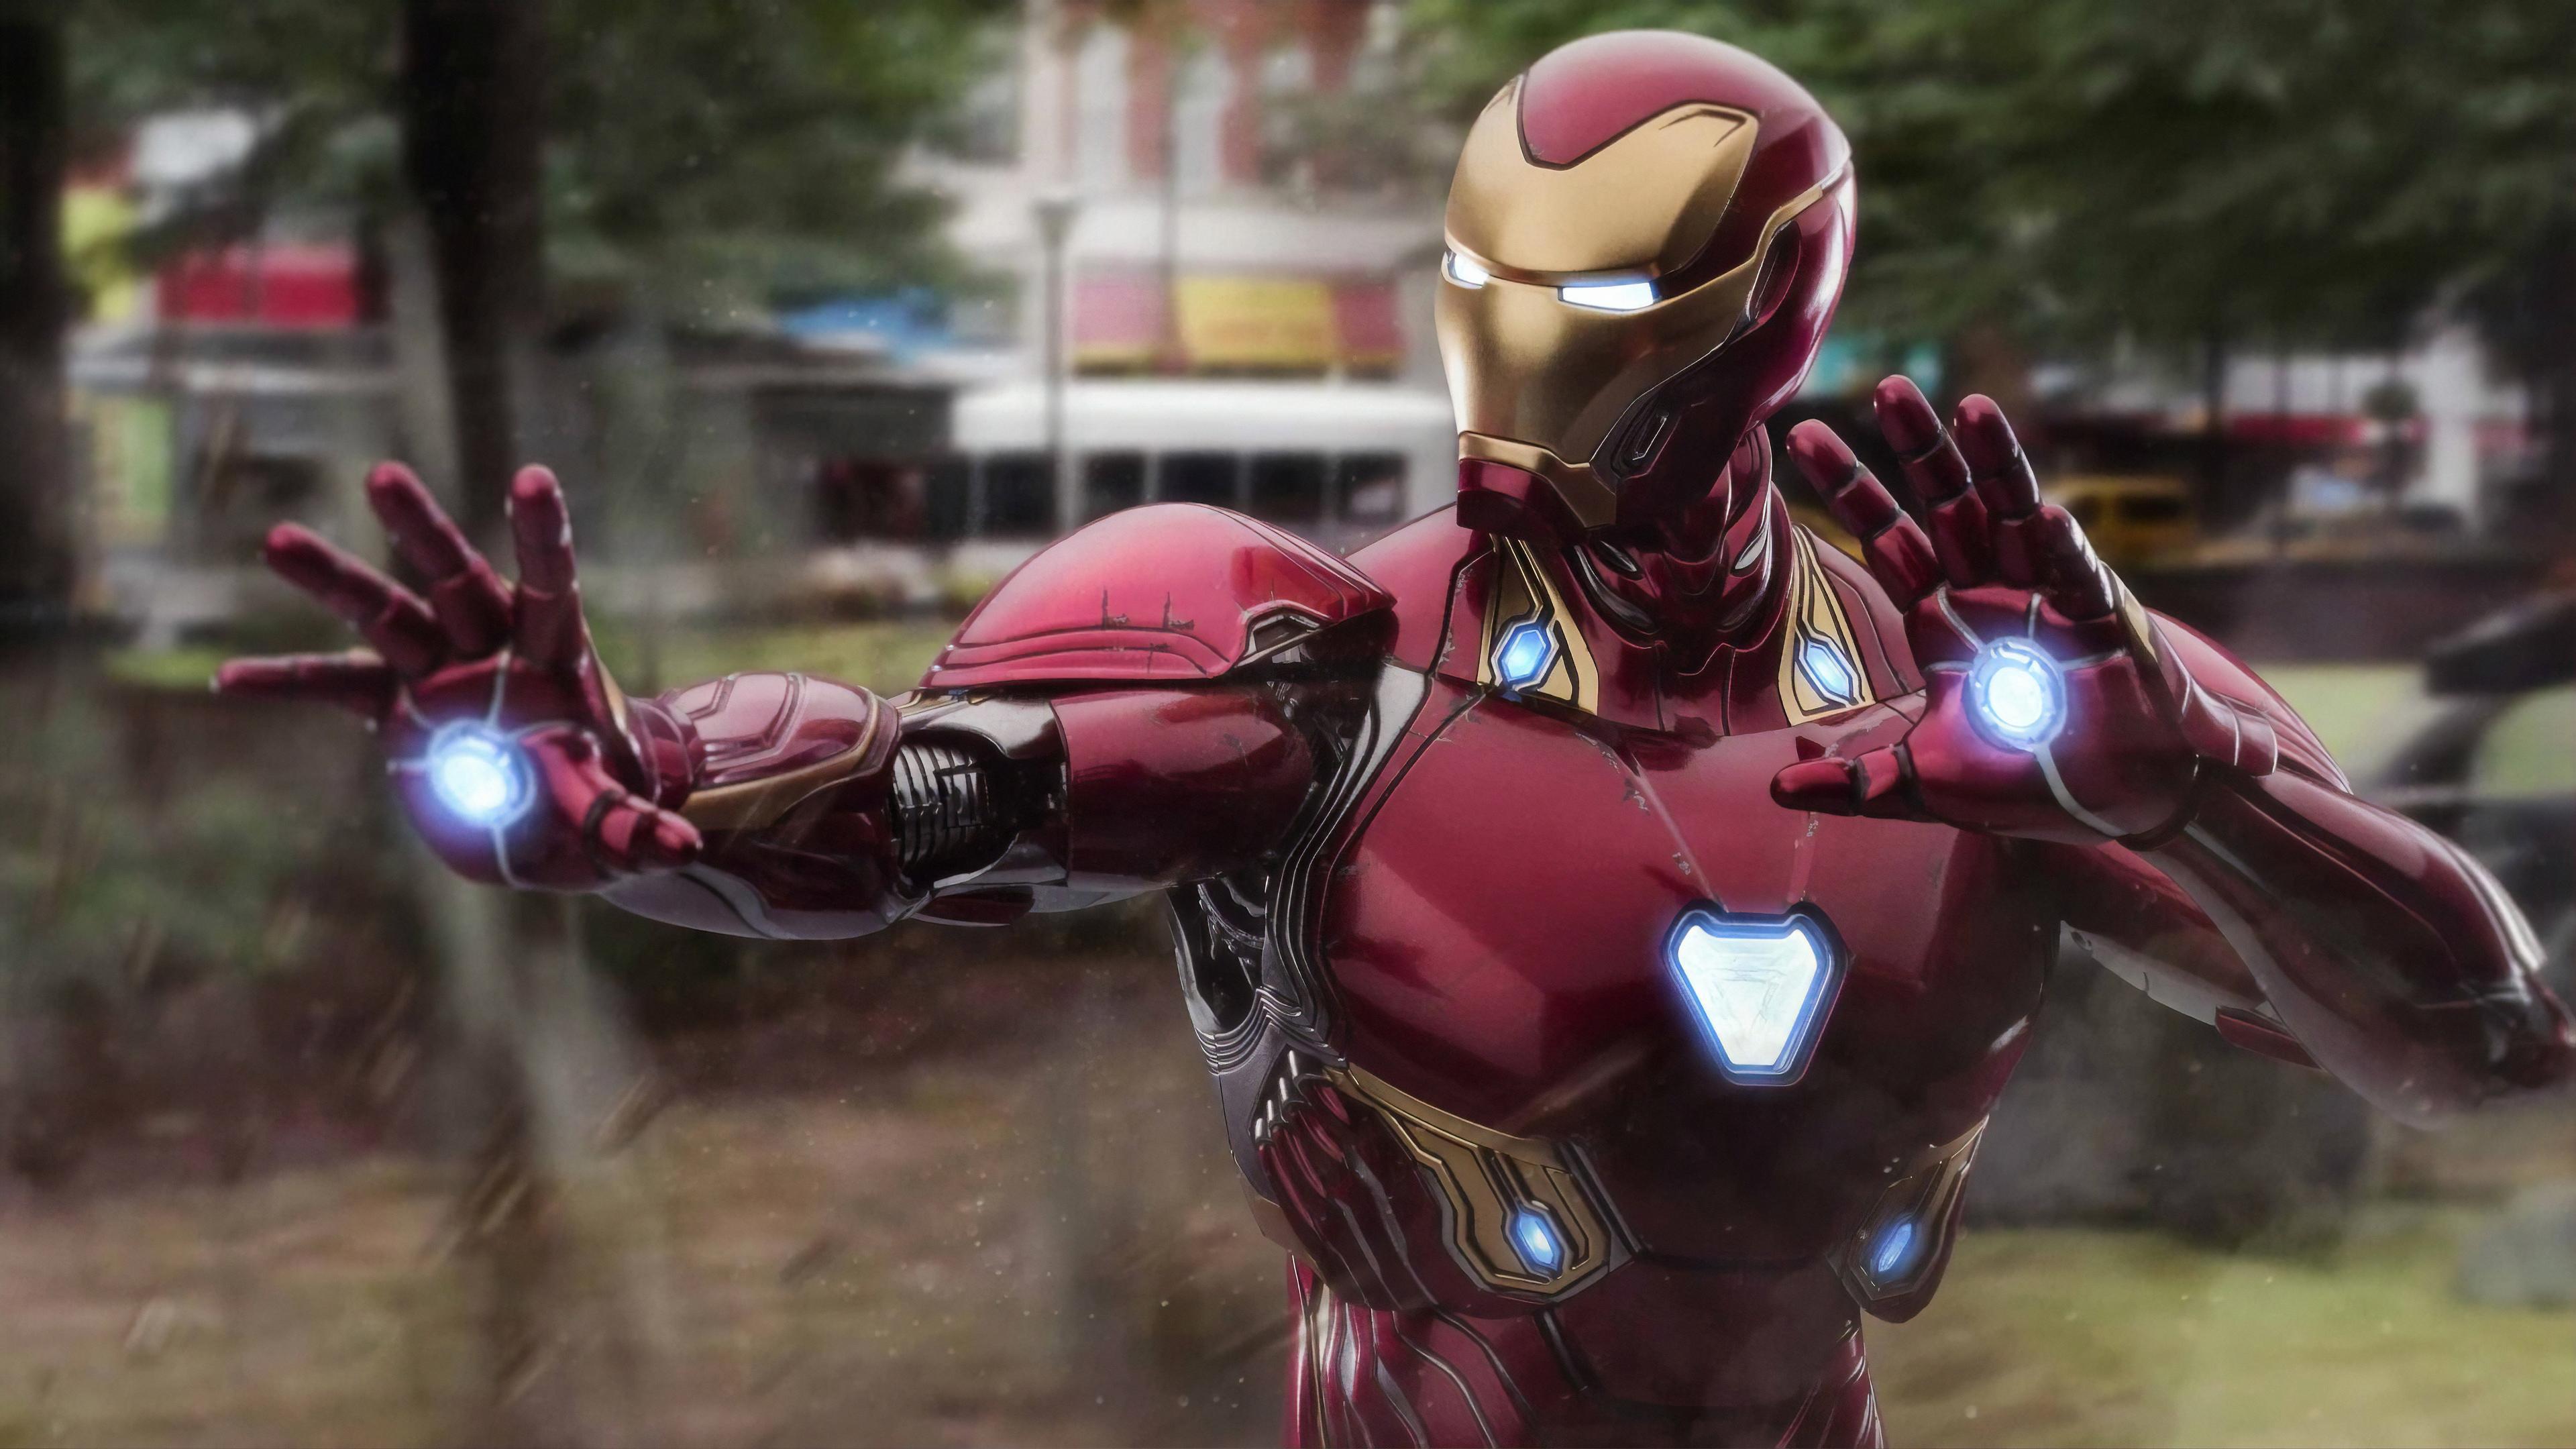 Iron Man Infinity War Desktop Wallpapers - Wallpaper Cave